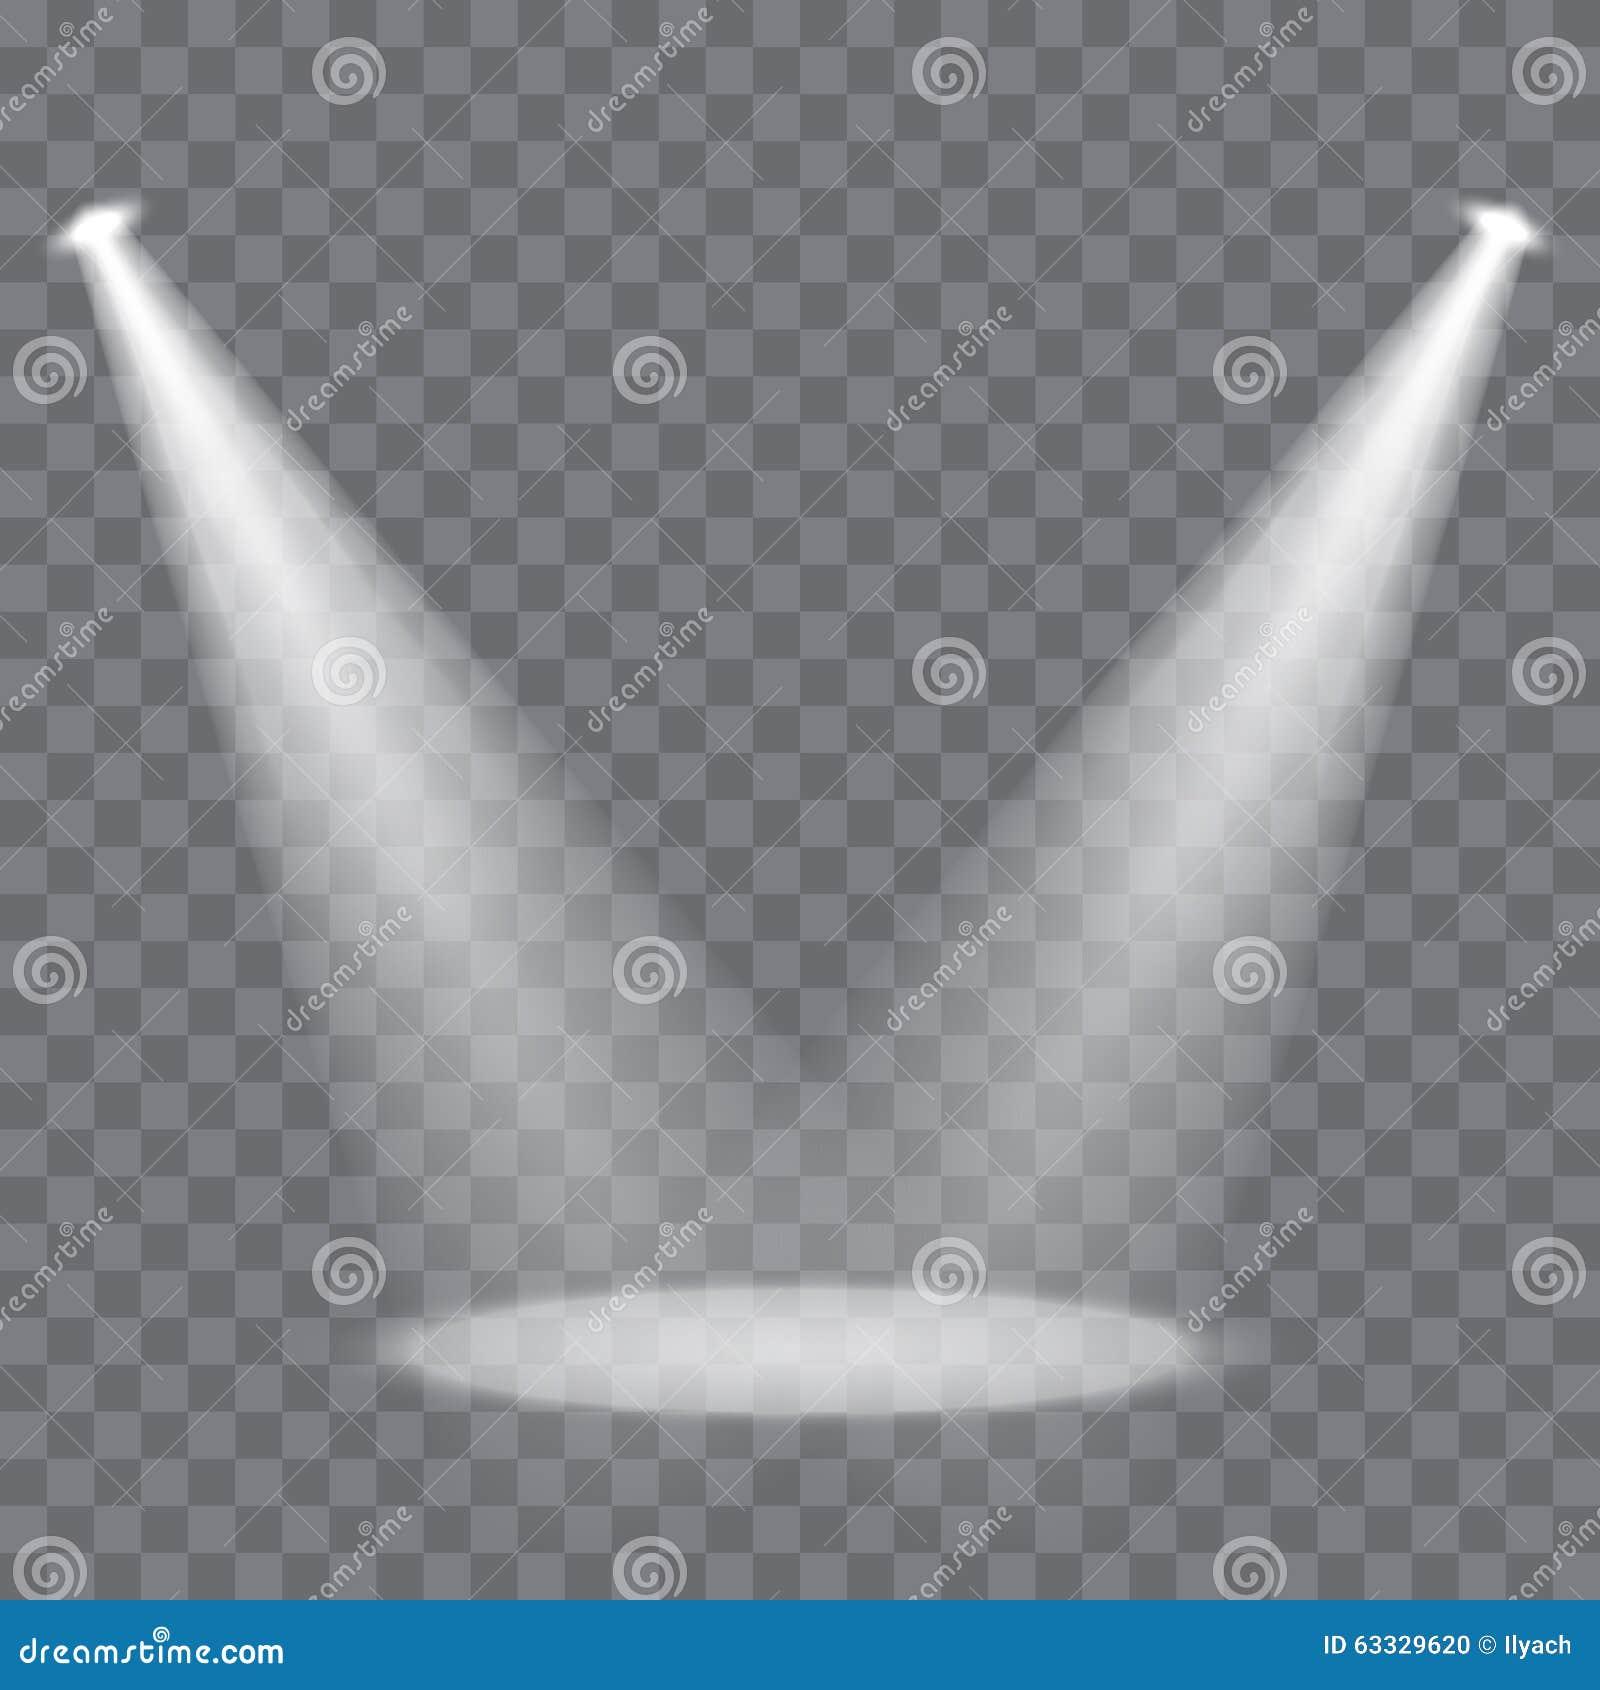 Vector Scene Spotlights Stock Illustration Image 63329620